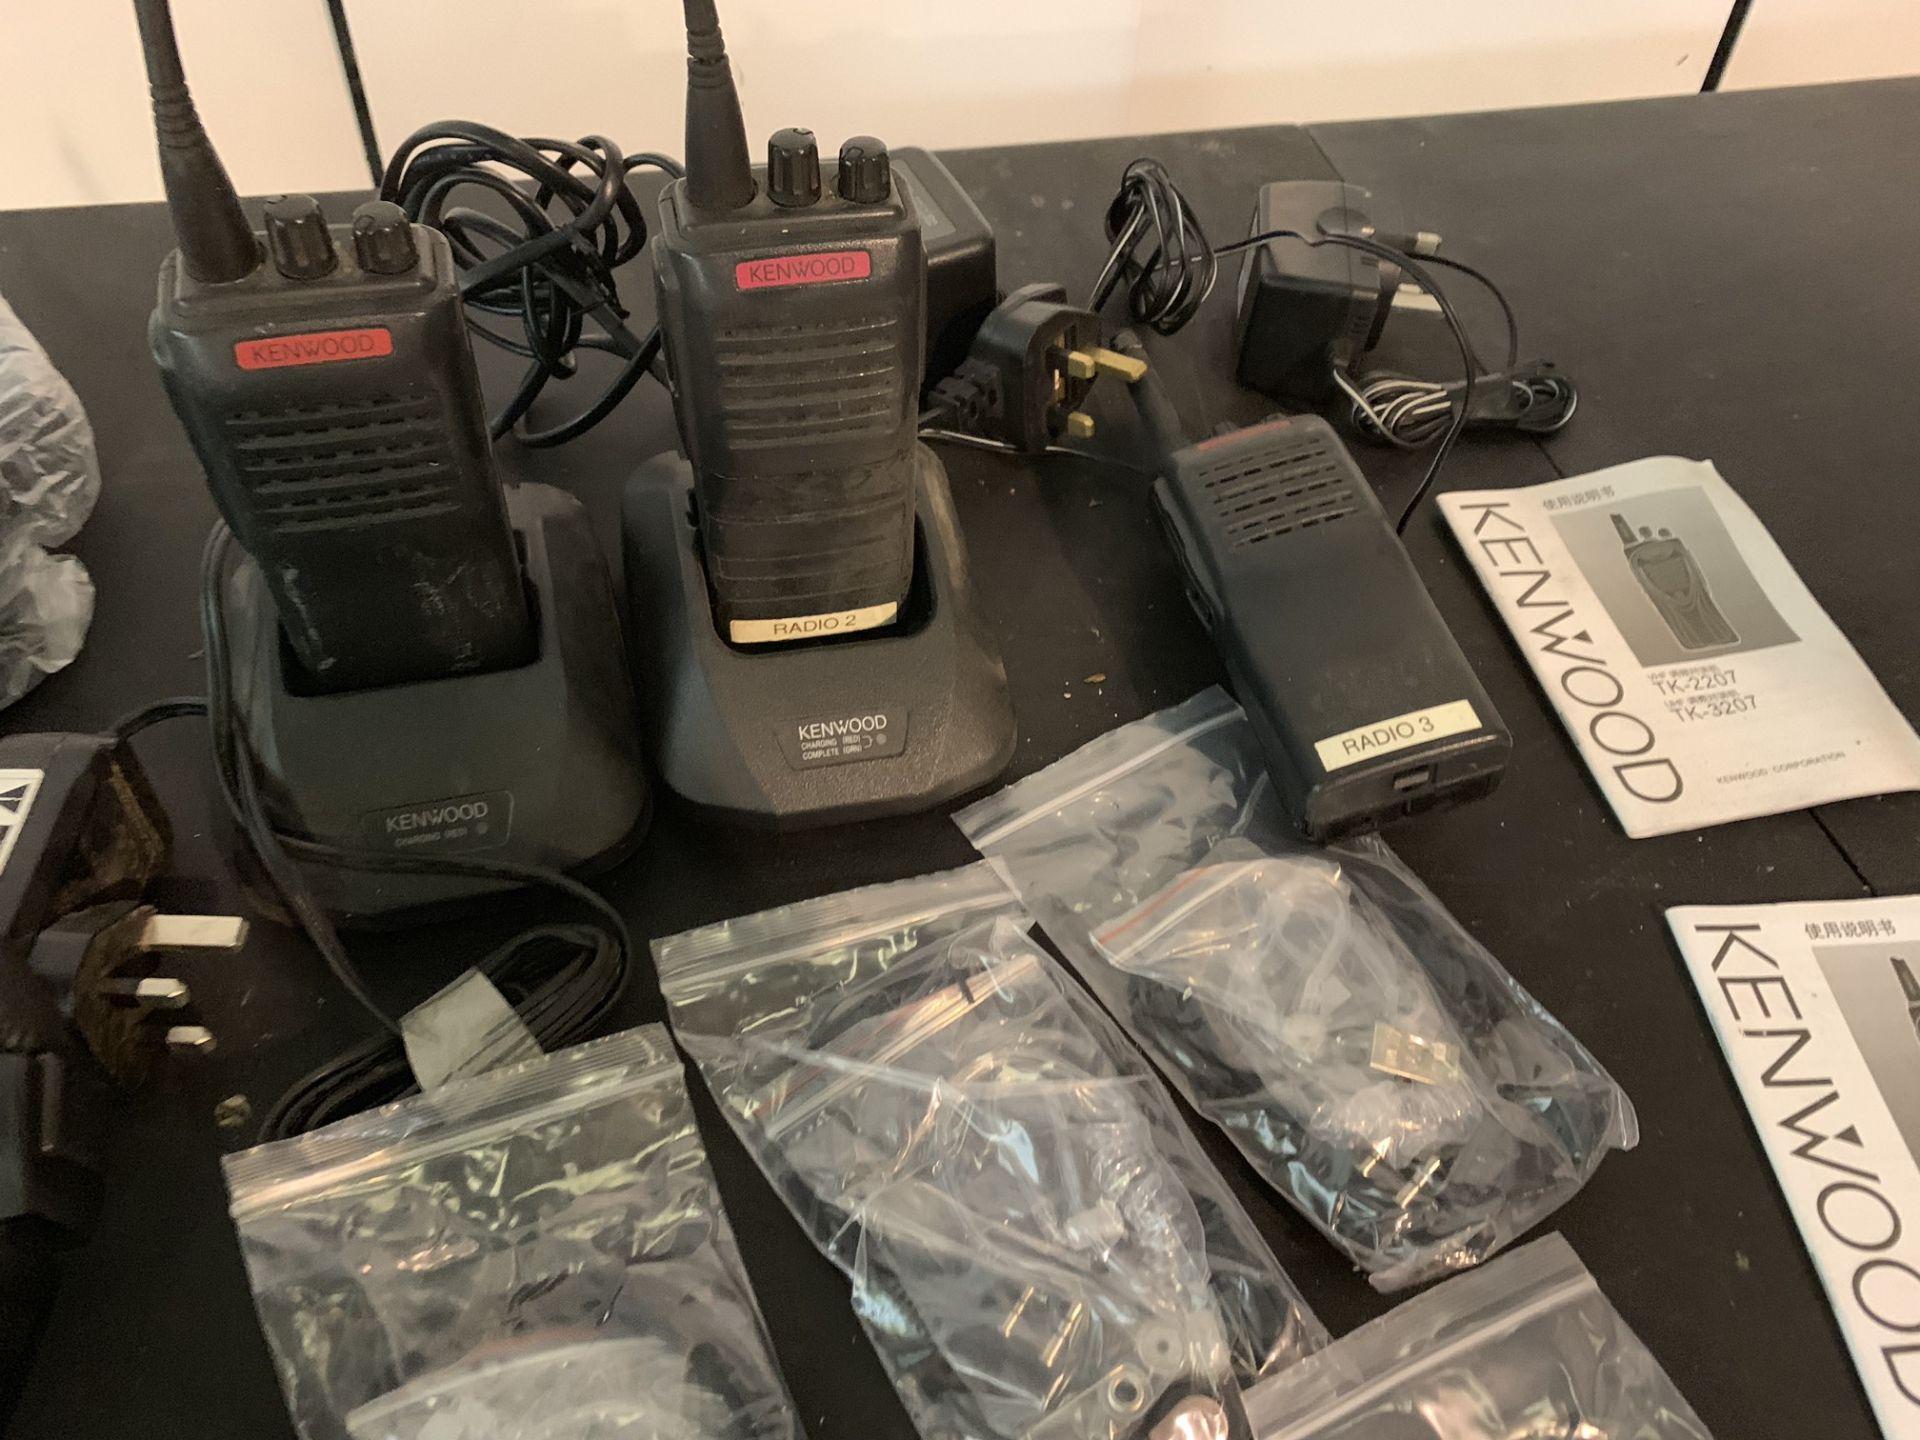 Lot 24 - 3 x KENWOOD RADIOS WITH 5 X EARPIECES & 4 X KANEN HEADPHONE